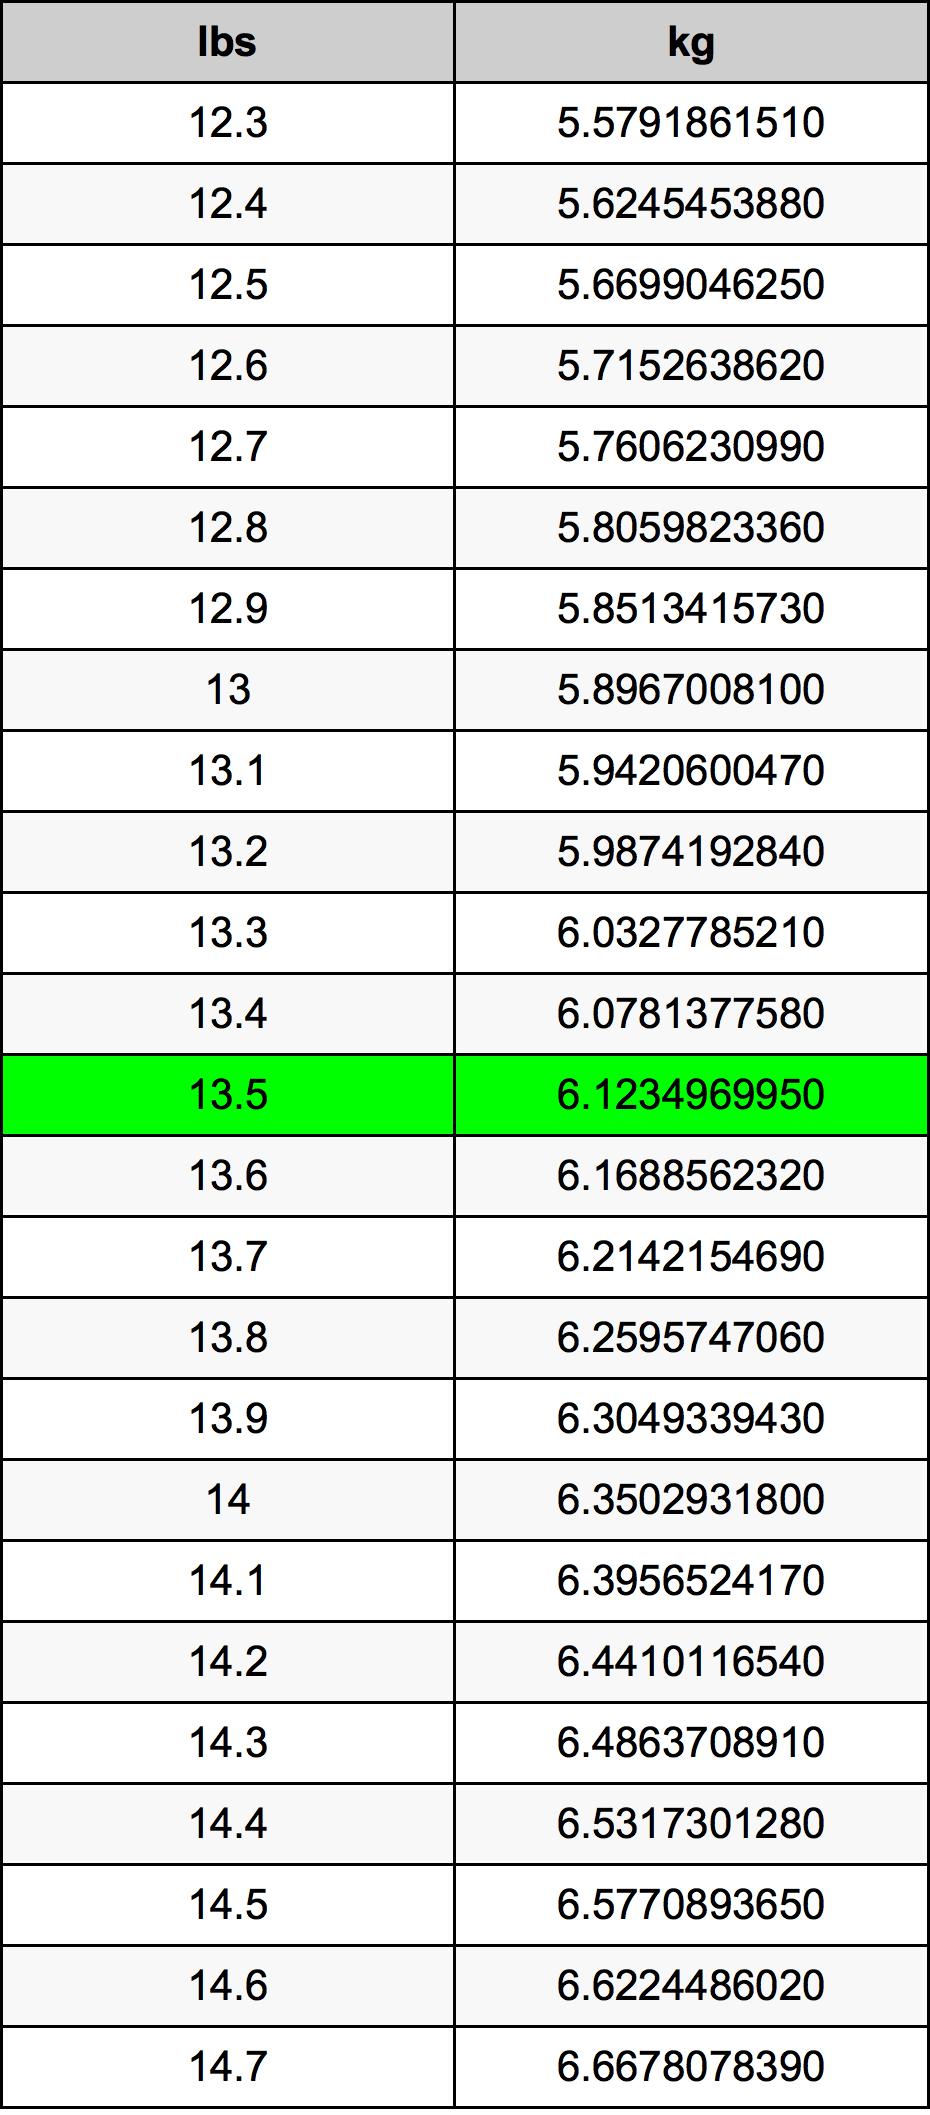 13.5 Pon konversi tabel